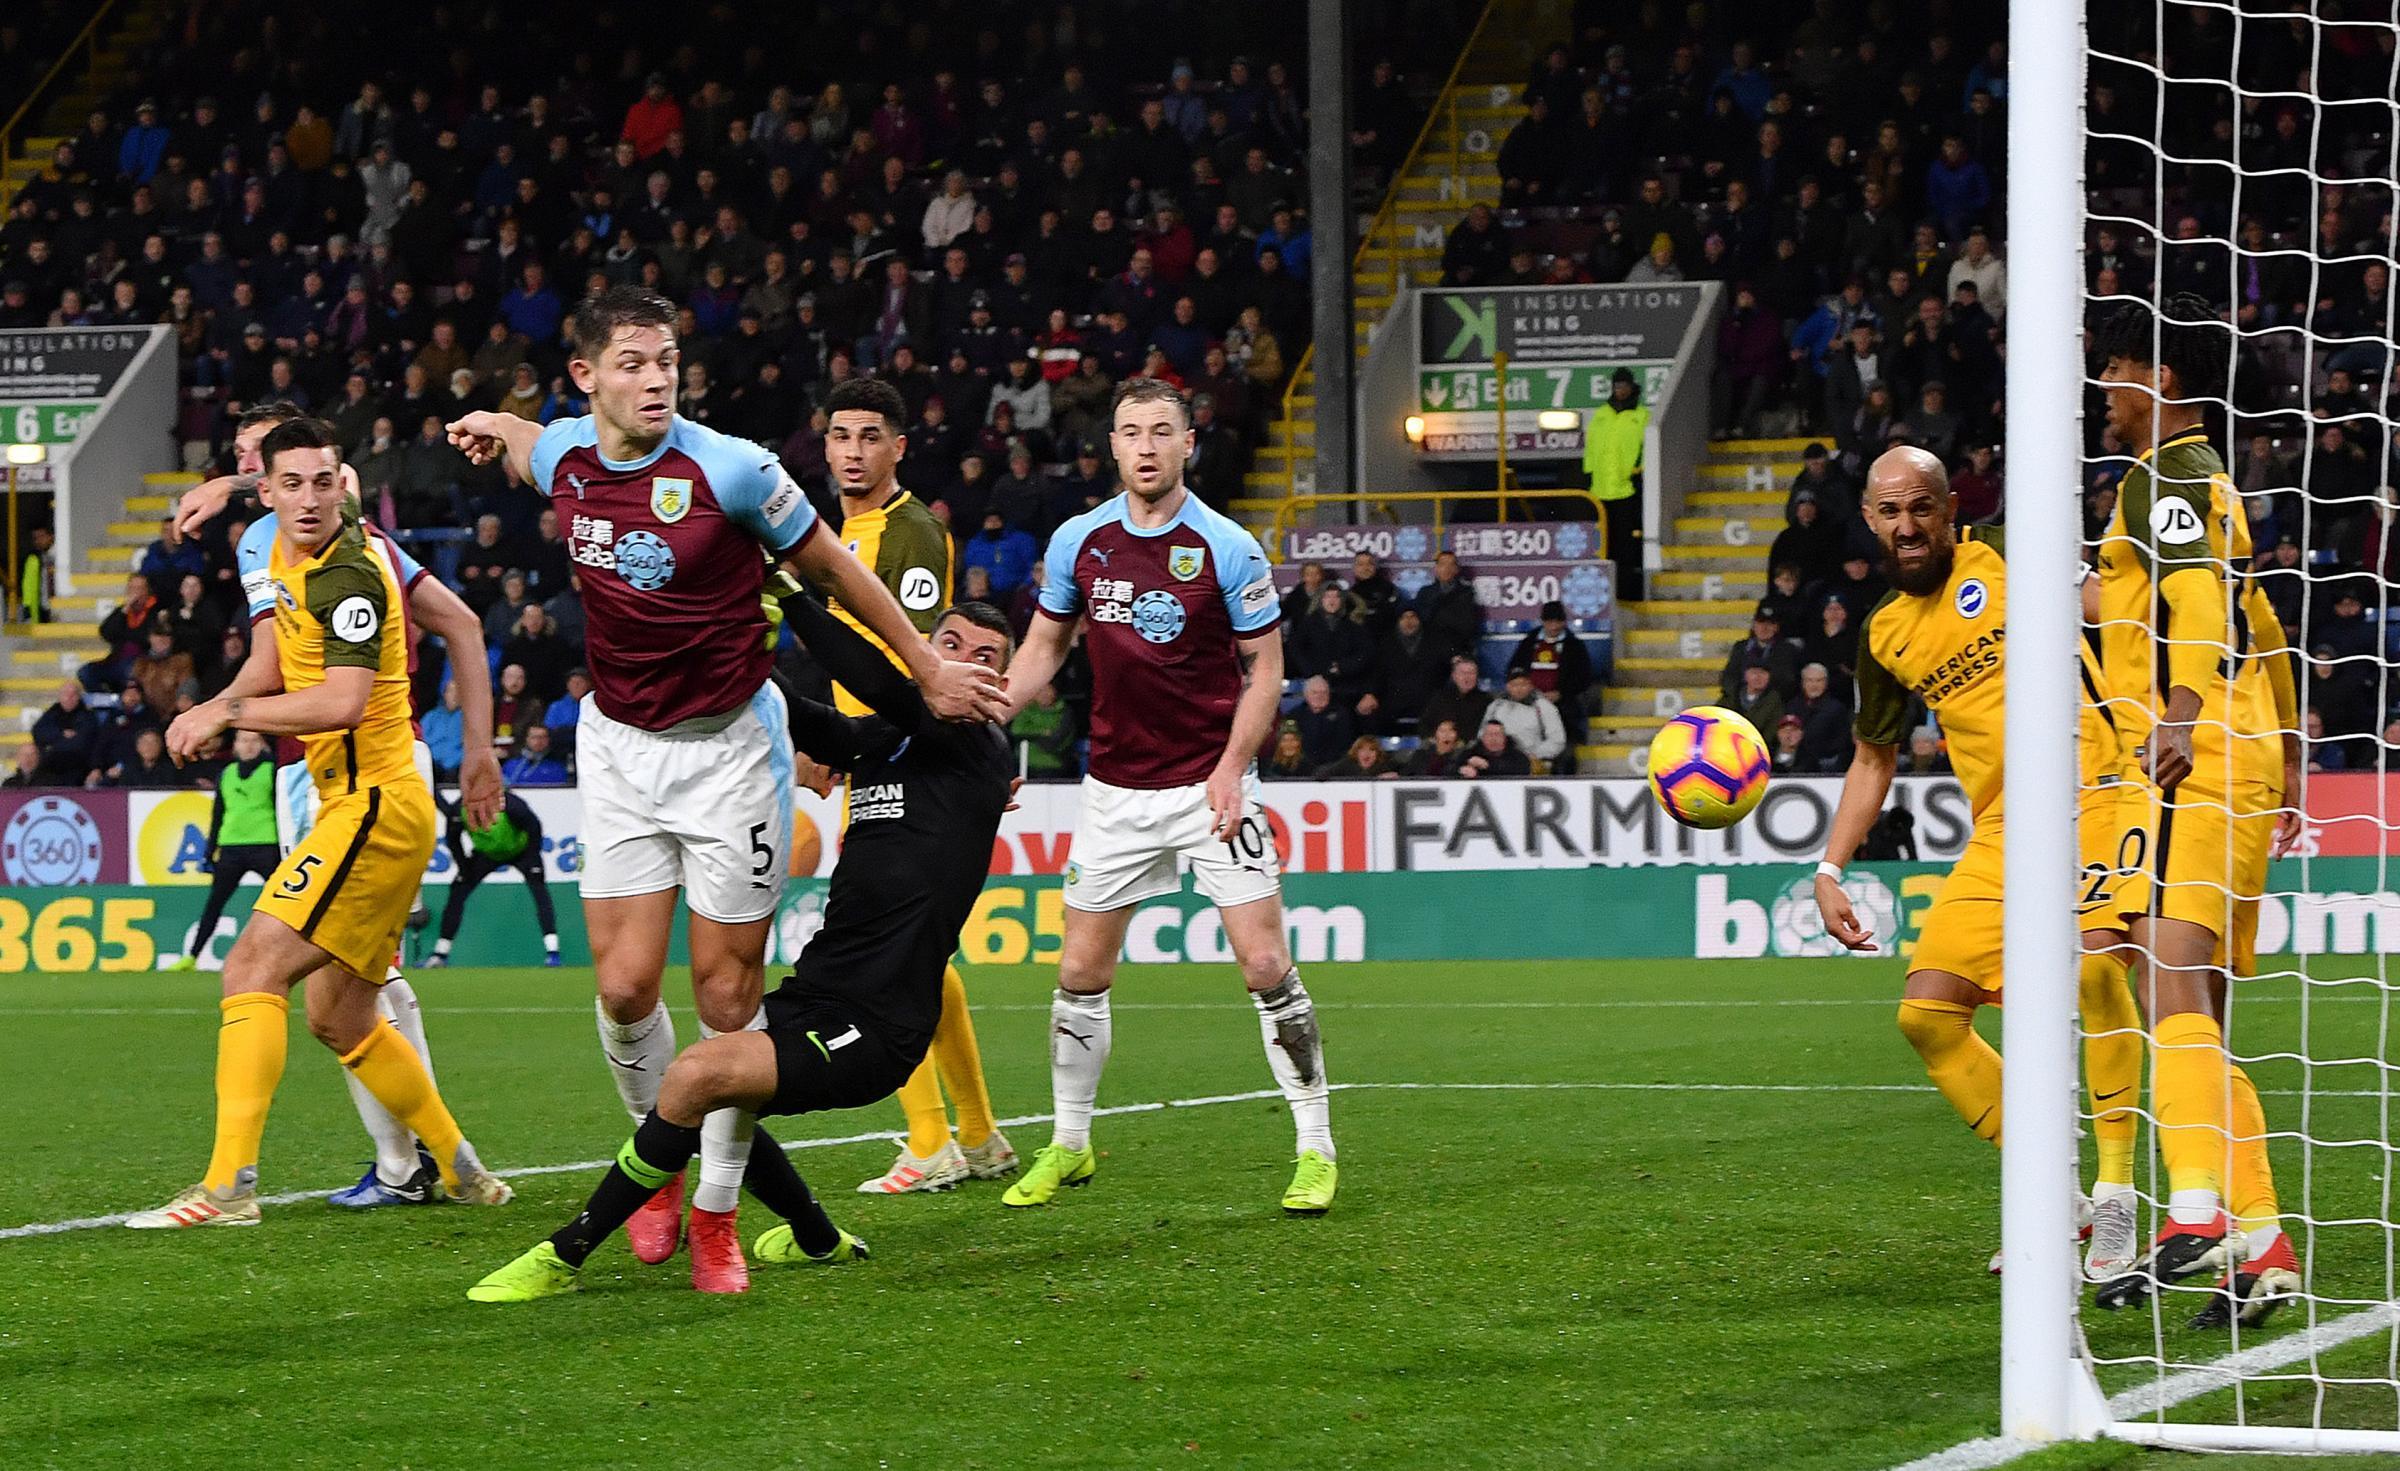 'That's just a start' says Burnley matchwinner James Tarkowski